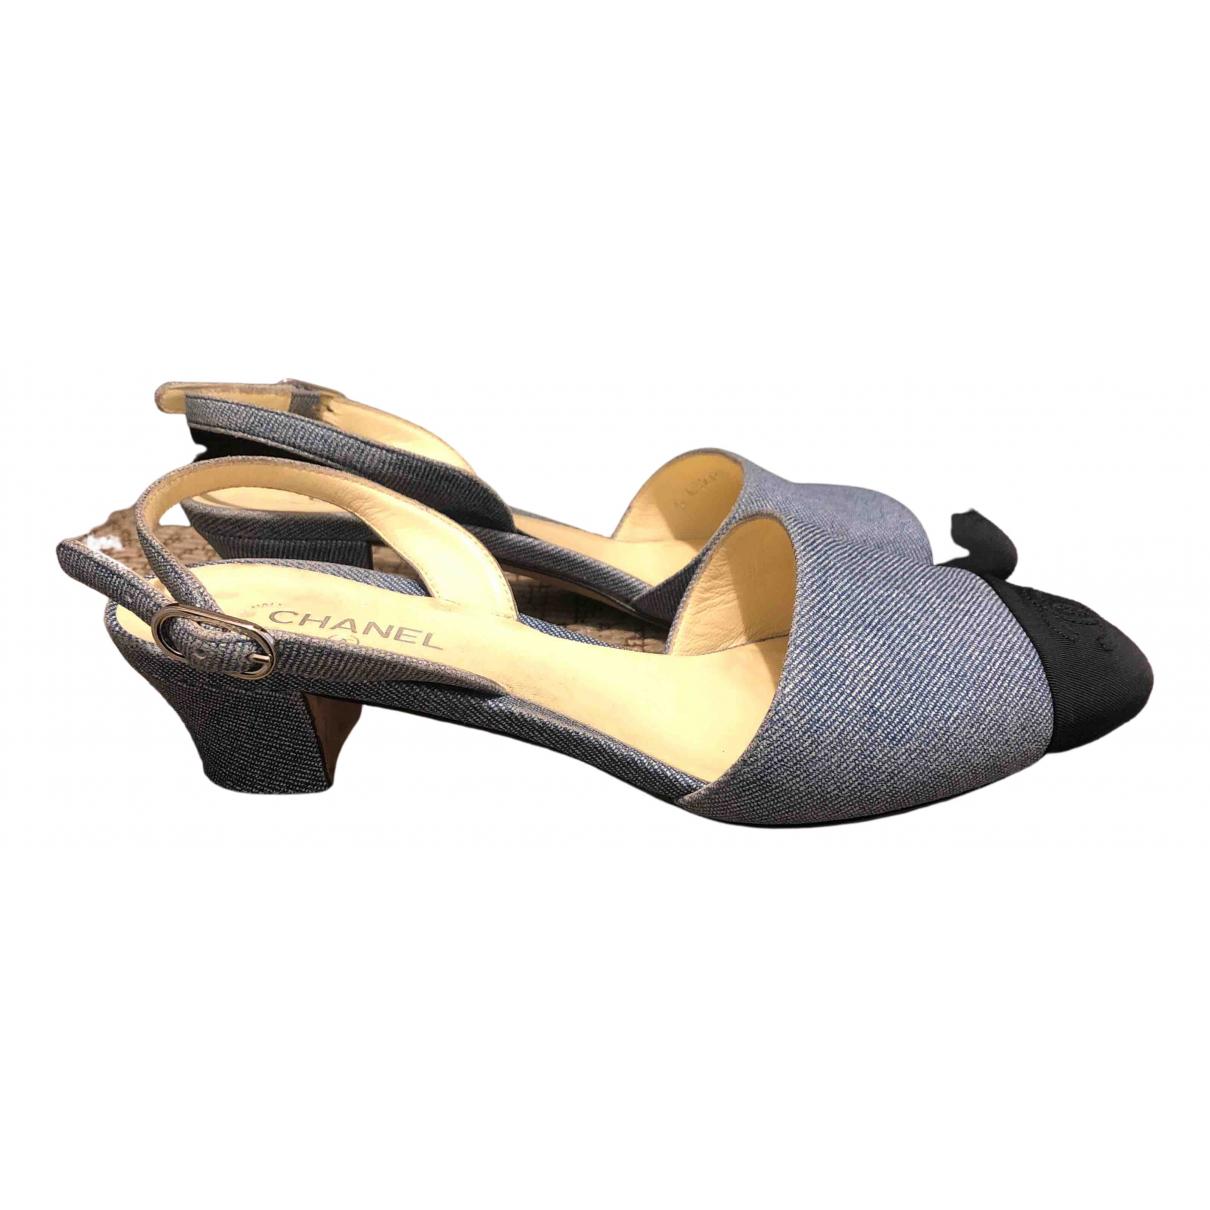 Chanel Slingback Blue Leather Heels for Women 37 EU